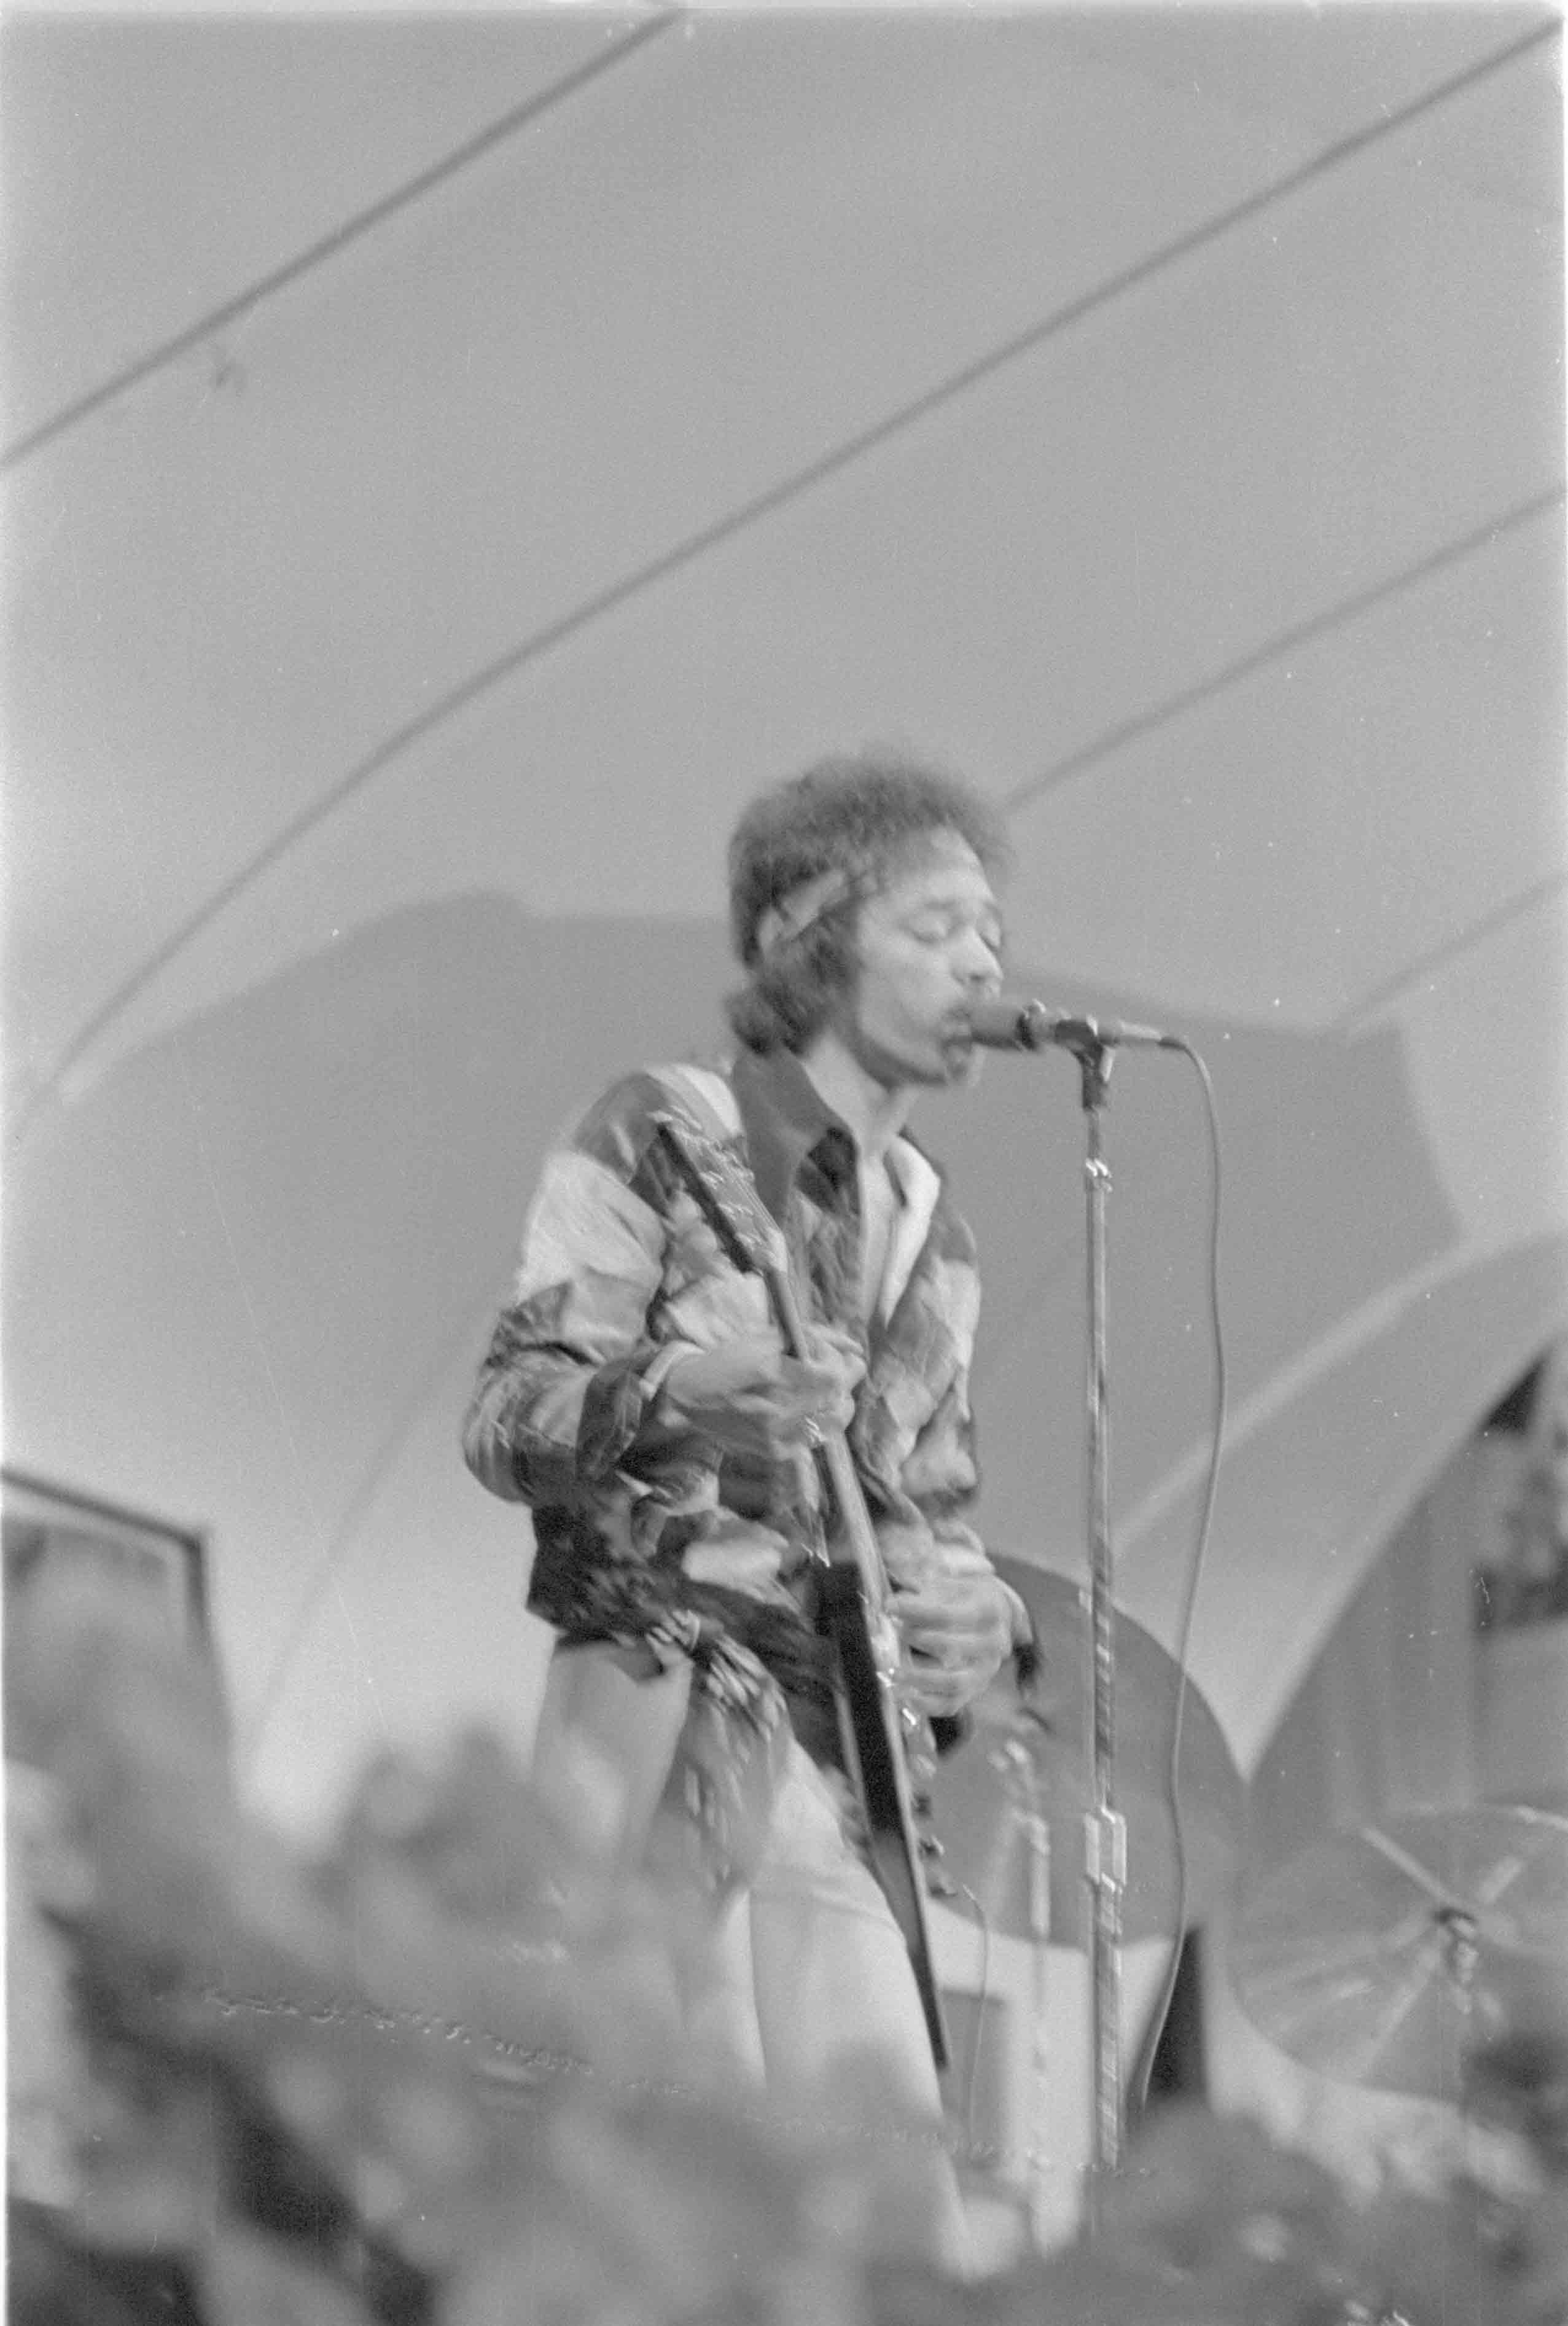 Stockholm (Tivoli Garden) : 31 août 1970 Af53a4b7c7ed5956bcf8ef4662aad1d8